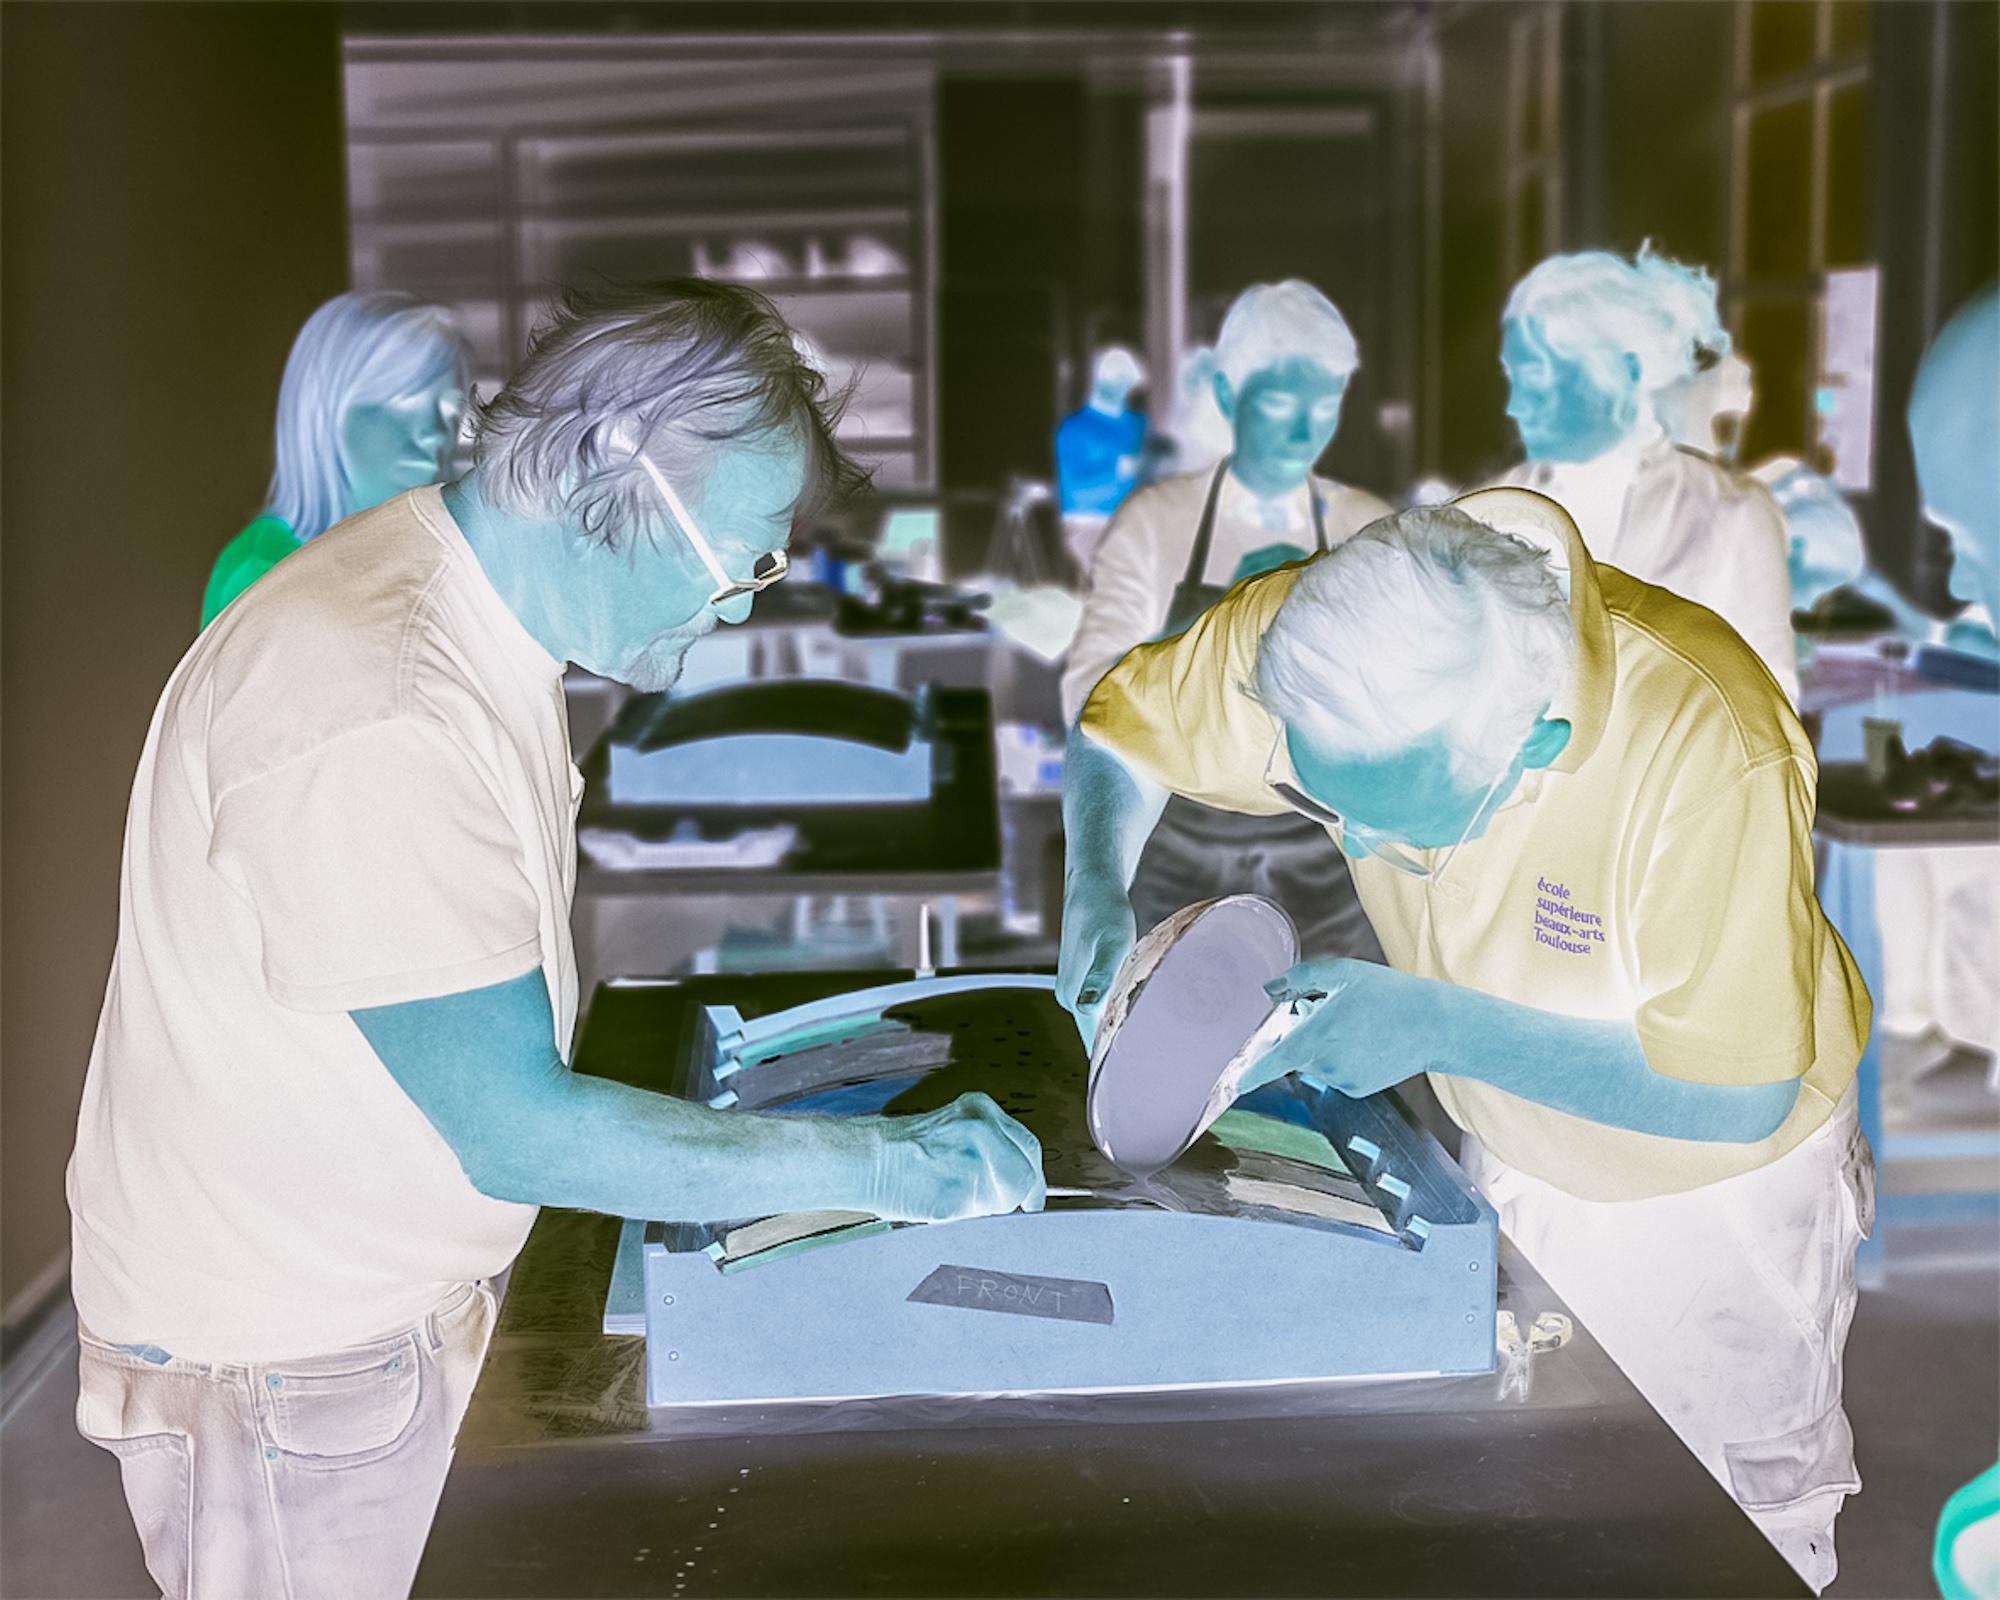 Krzysztof Pijarski, Aurélien Froment, Moiré, widok wystawy